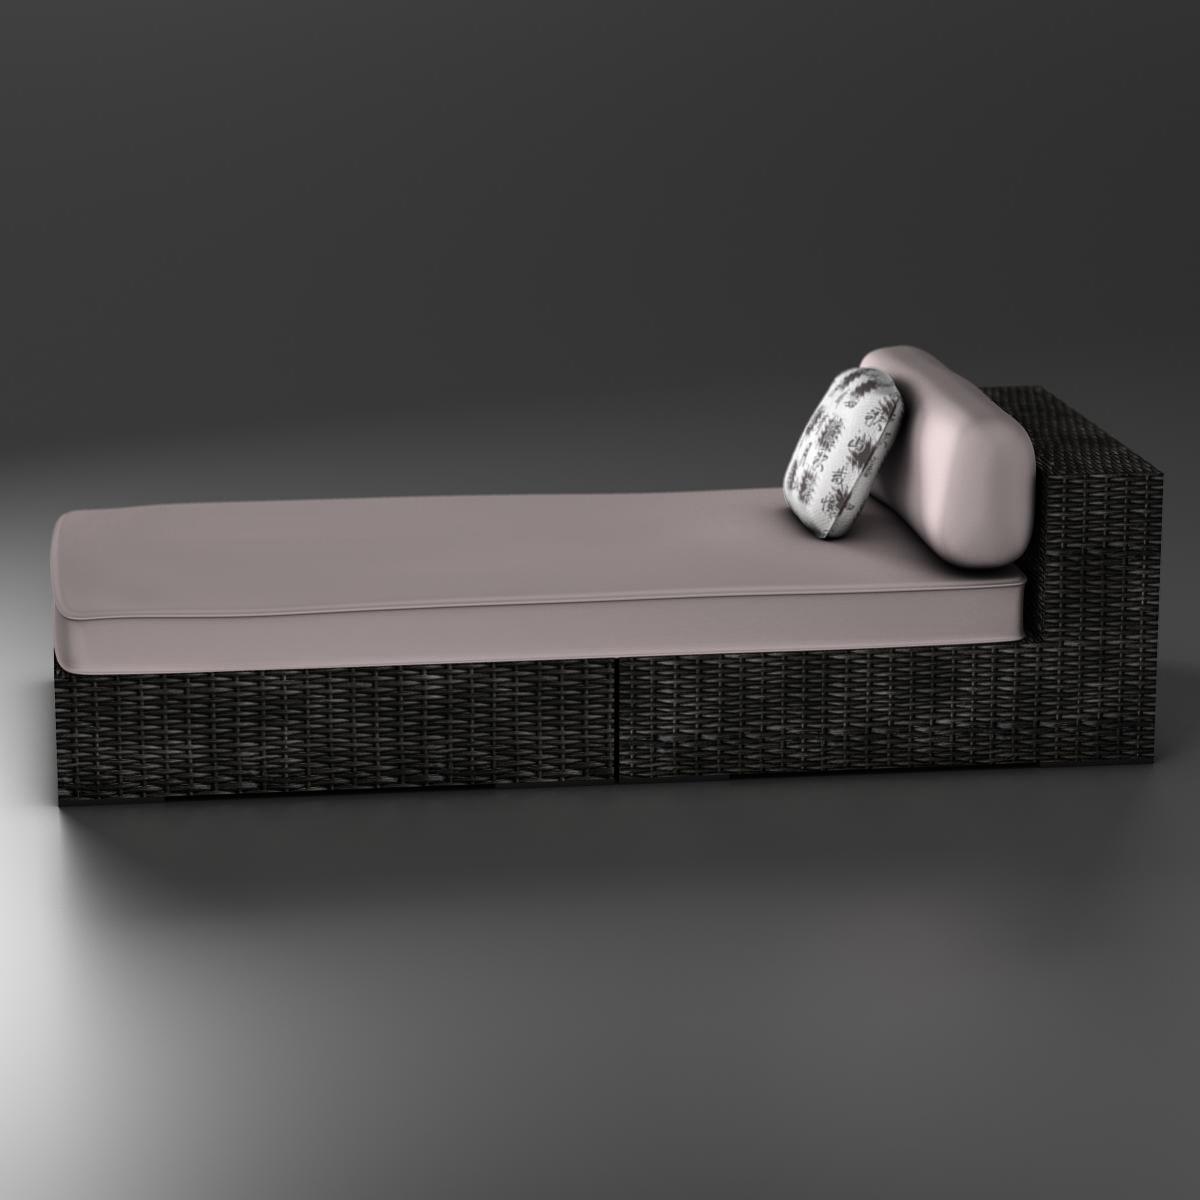 rattan chaise 3d загвар 3ds max fbx c4d ma mb obj 162558